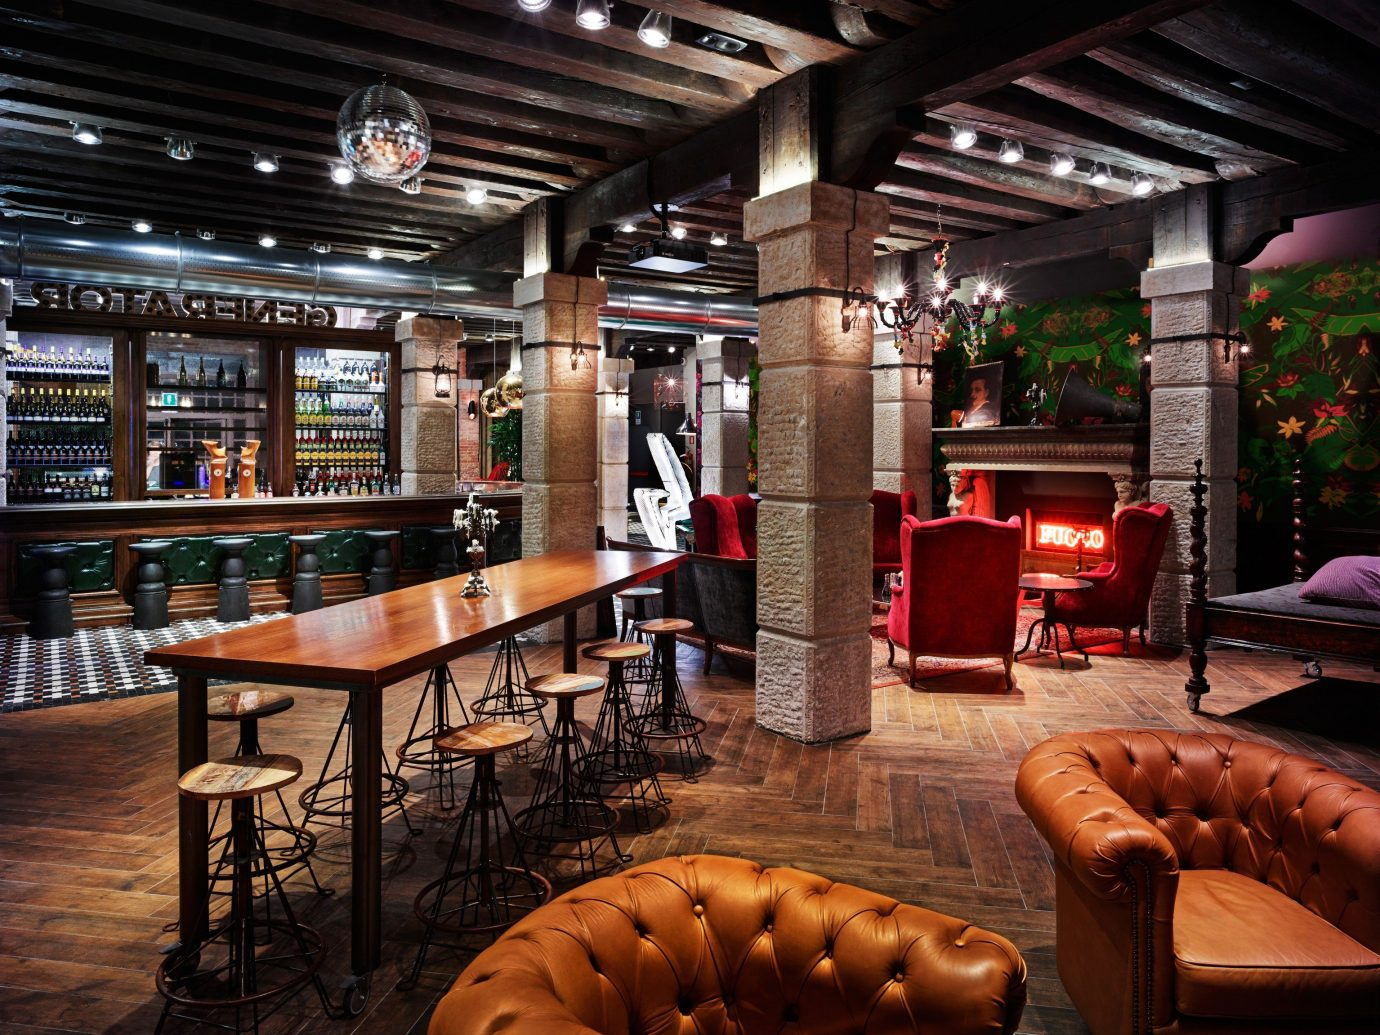 Hotels indoor chair ceiling room Lobby Bar restaurant interior design café furniture area